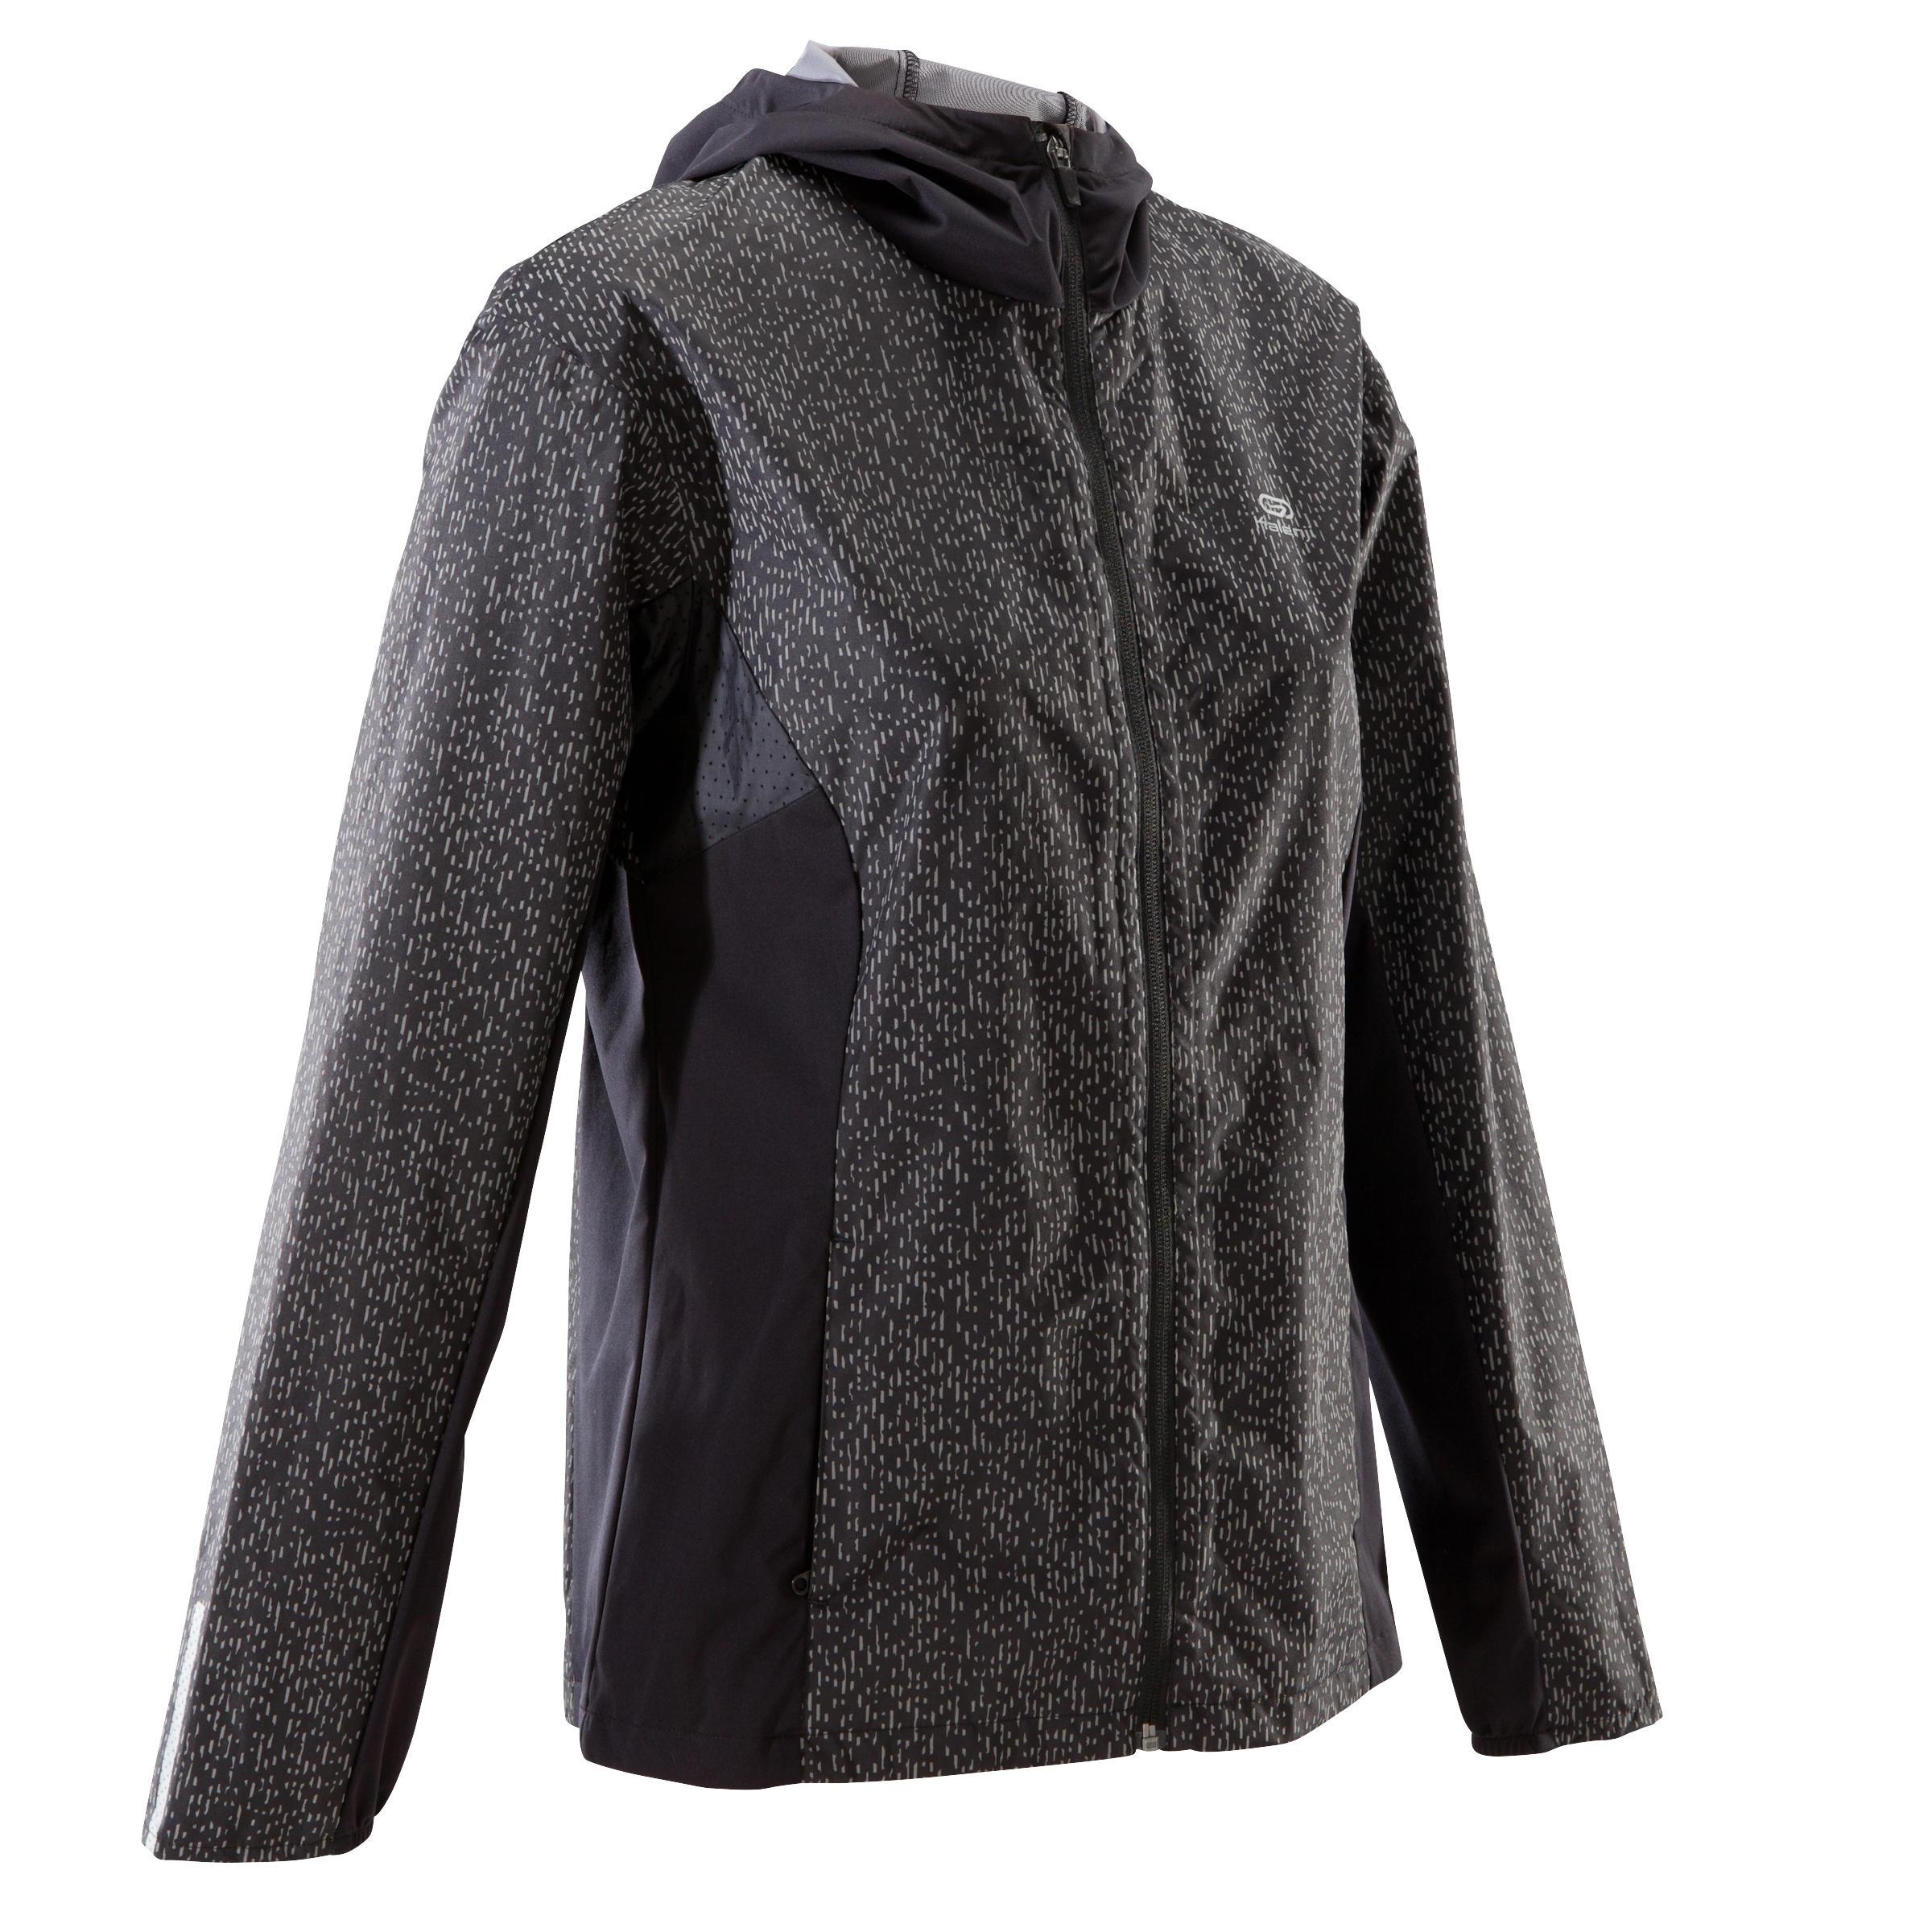 Jachetă Run Rain Negru Damă imagine